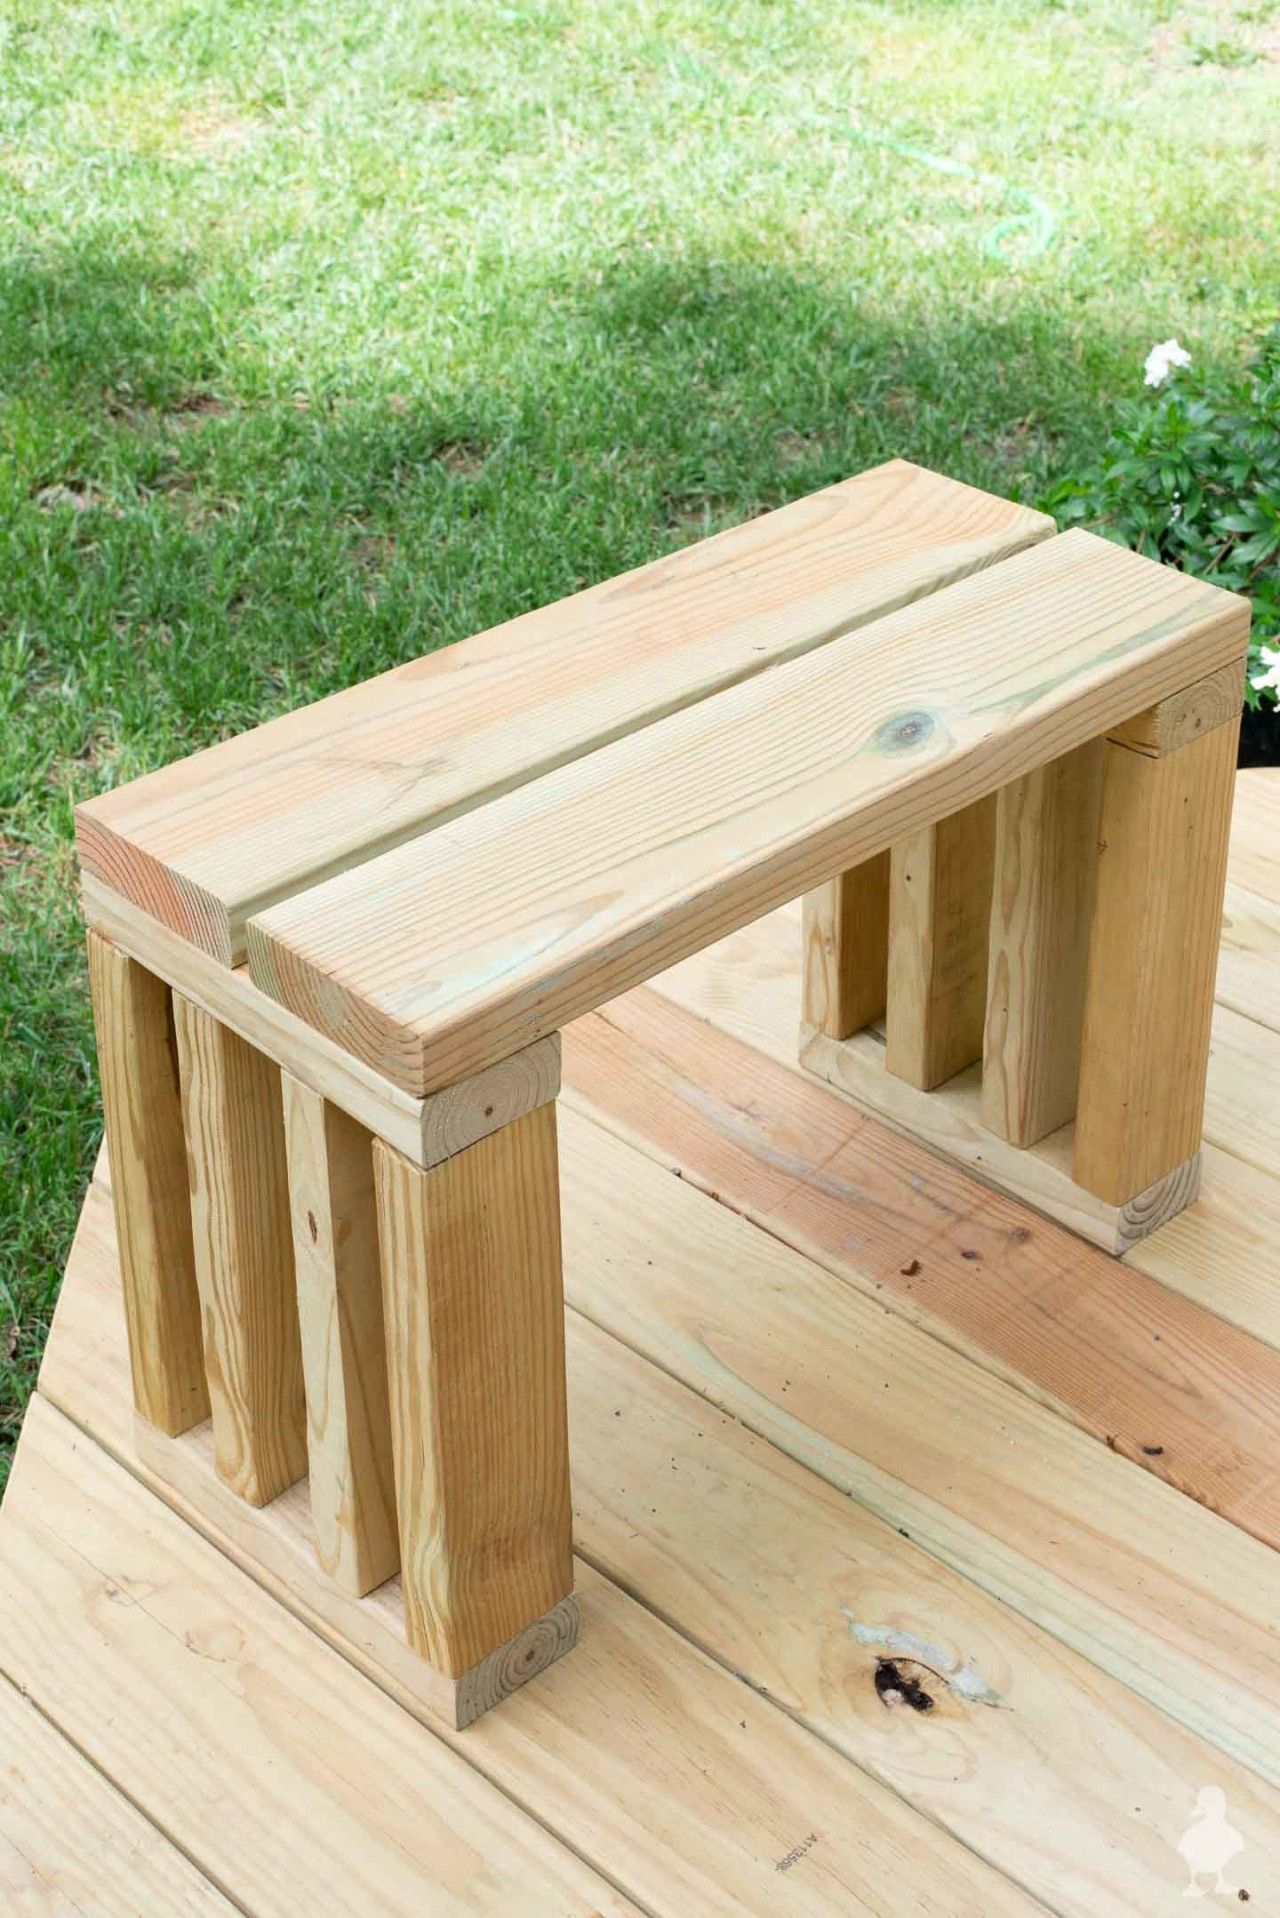 L Shaped Diy Backyard Bench Just 130 Diy Bench Outdoor Diy